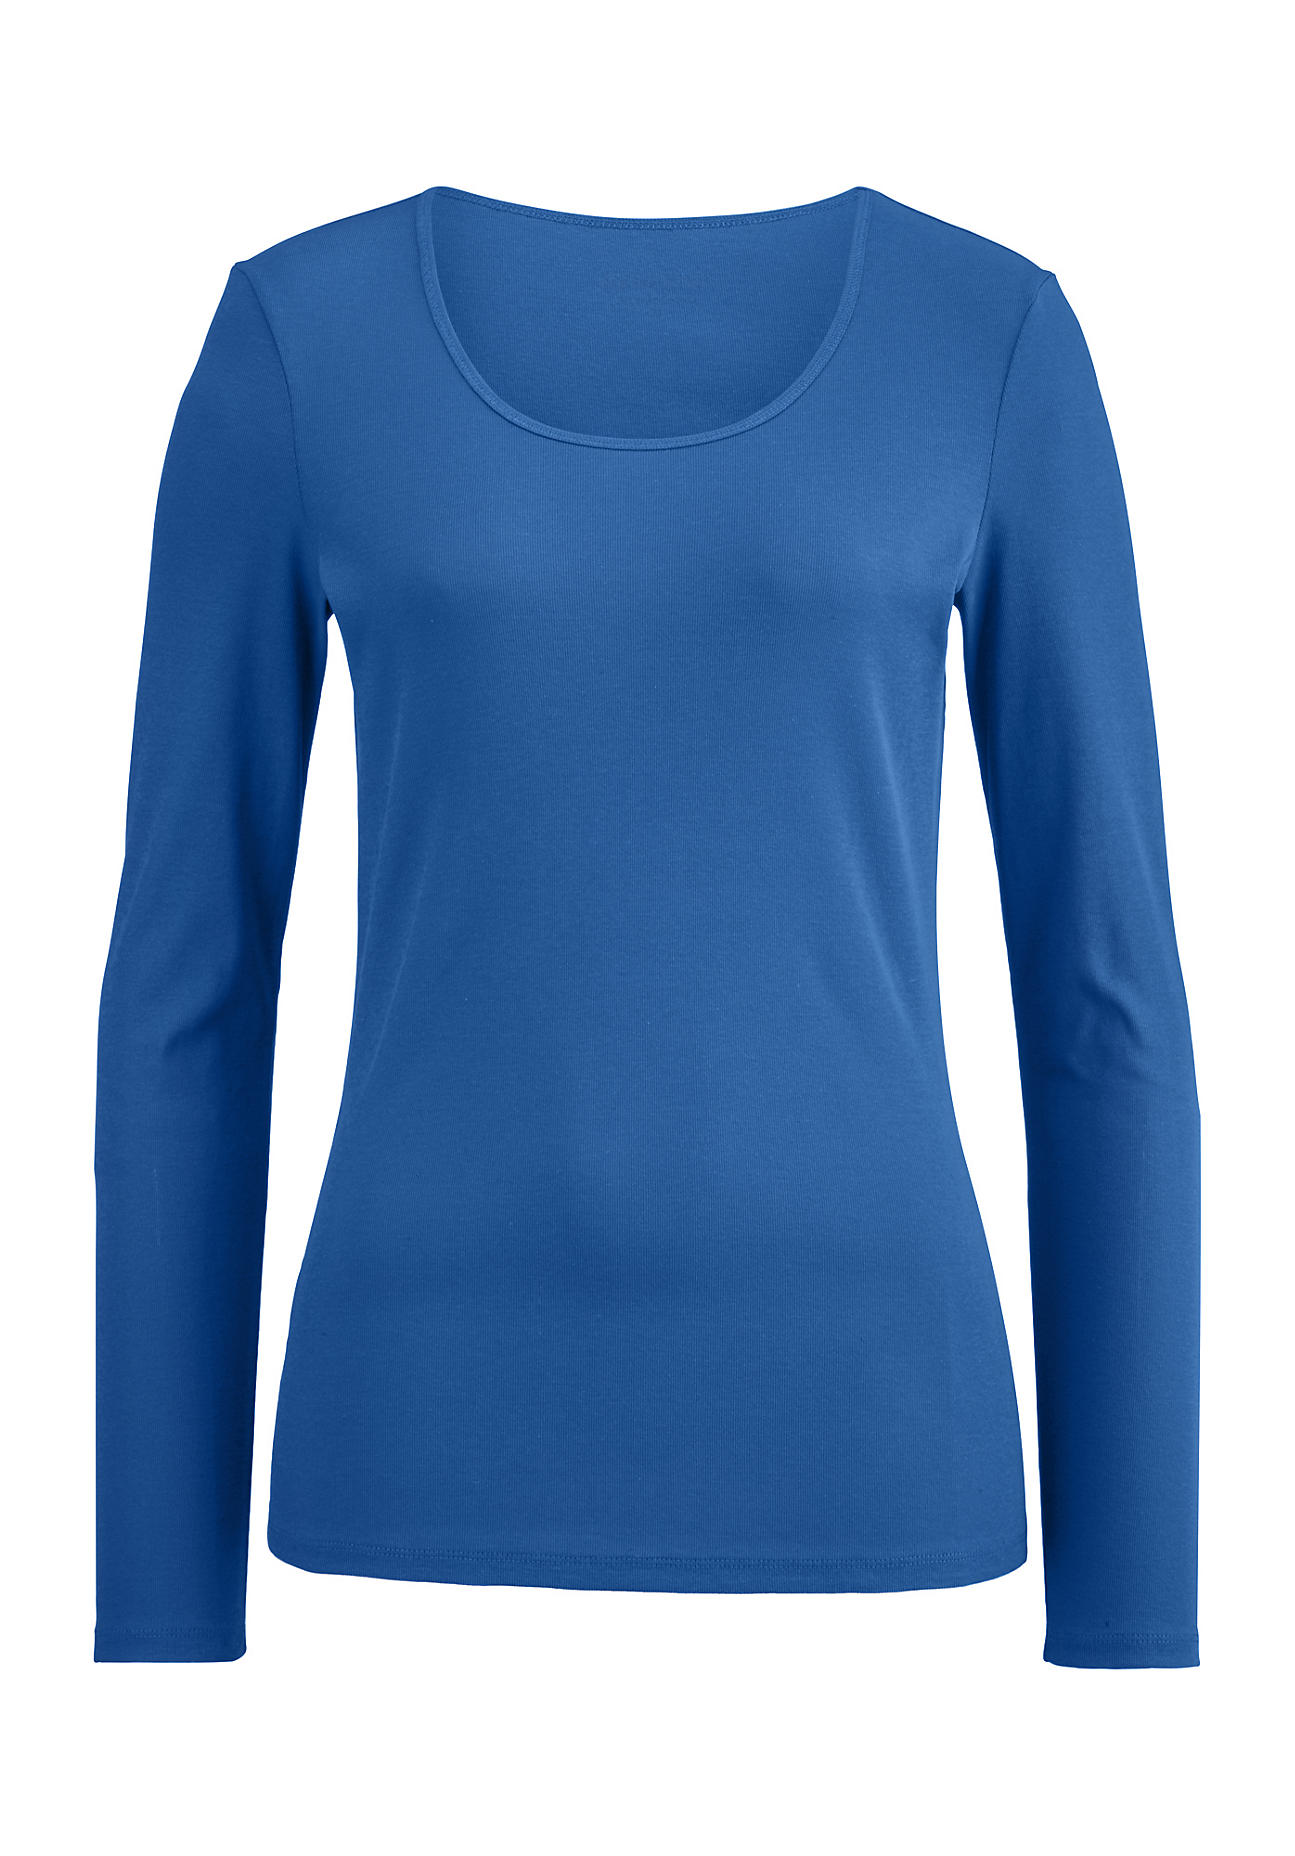 hessnatur Damen Langarm-Shirt aus Bio-Baumwolle – blau – Größe 36 | Bekleidung > Shirts > Langarmshirts | hessnatur